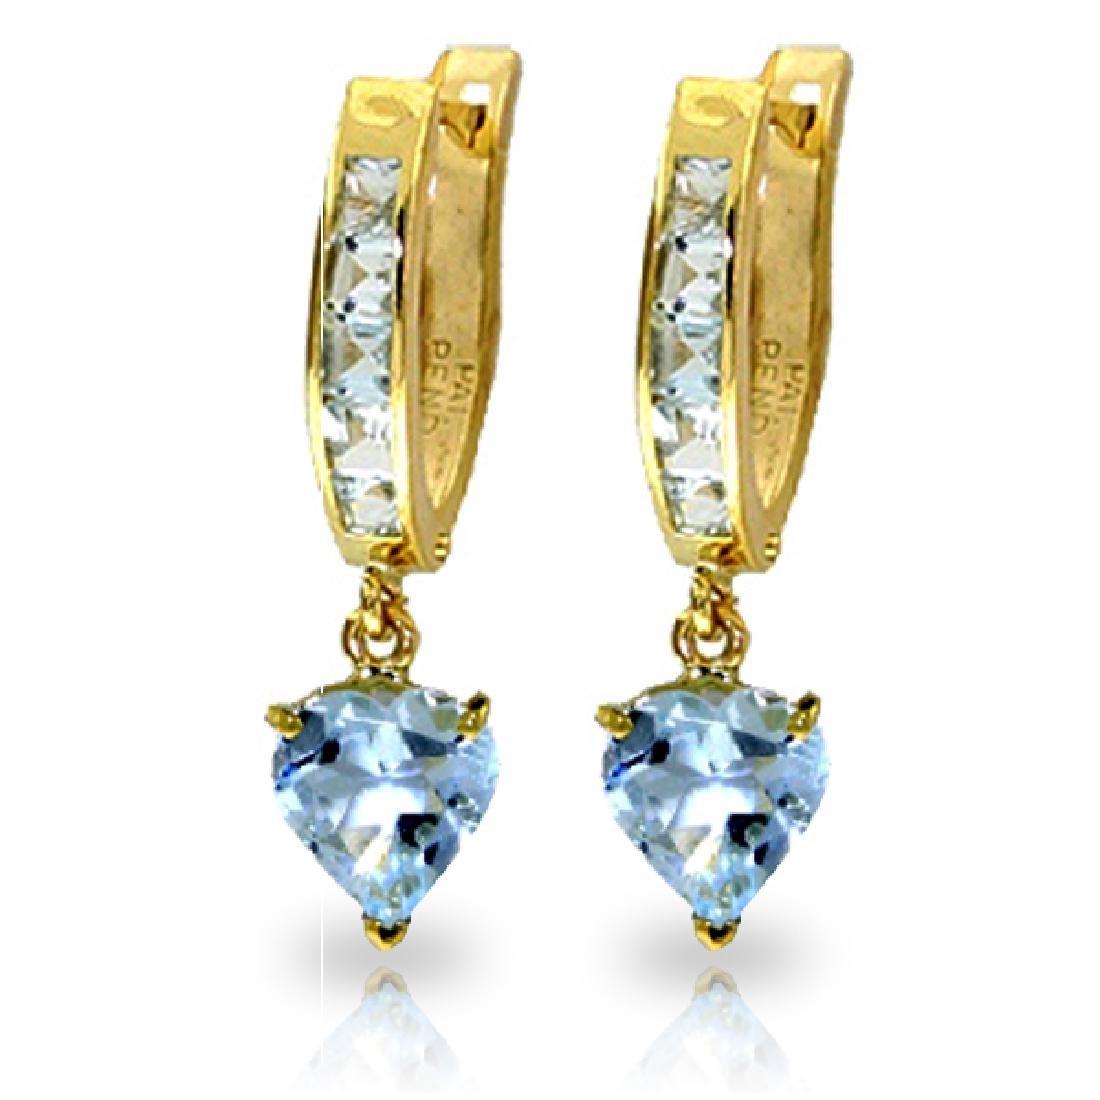 Genuine 4.1 ctw Aquamarine Earrings Jewelry 14KT Yellow